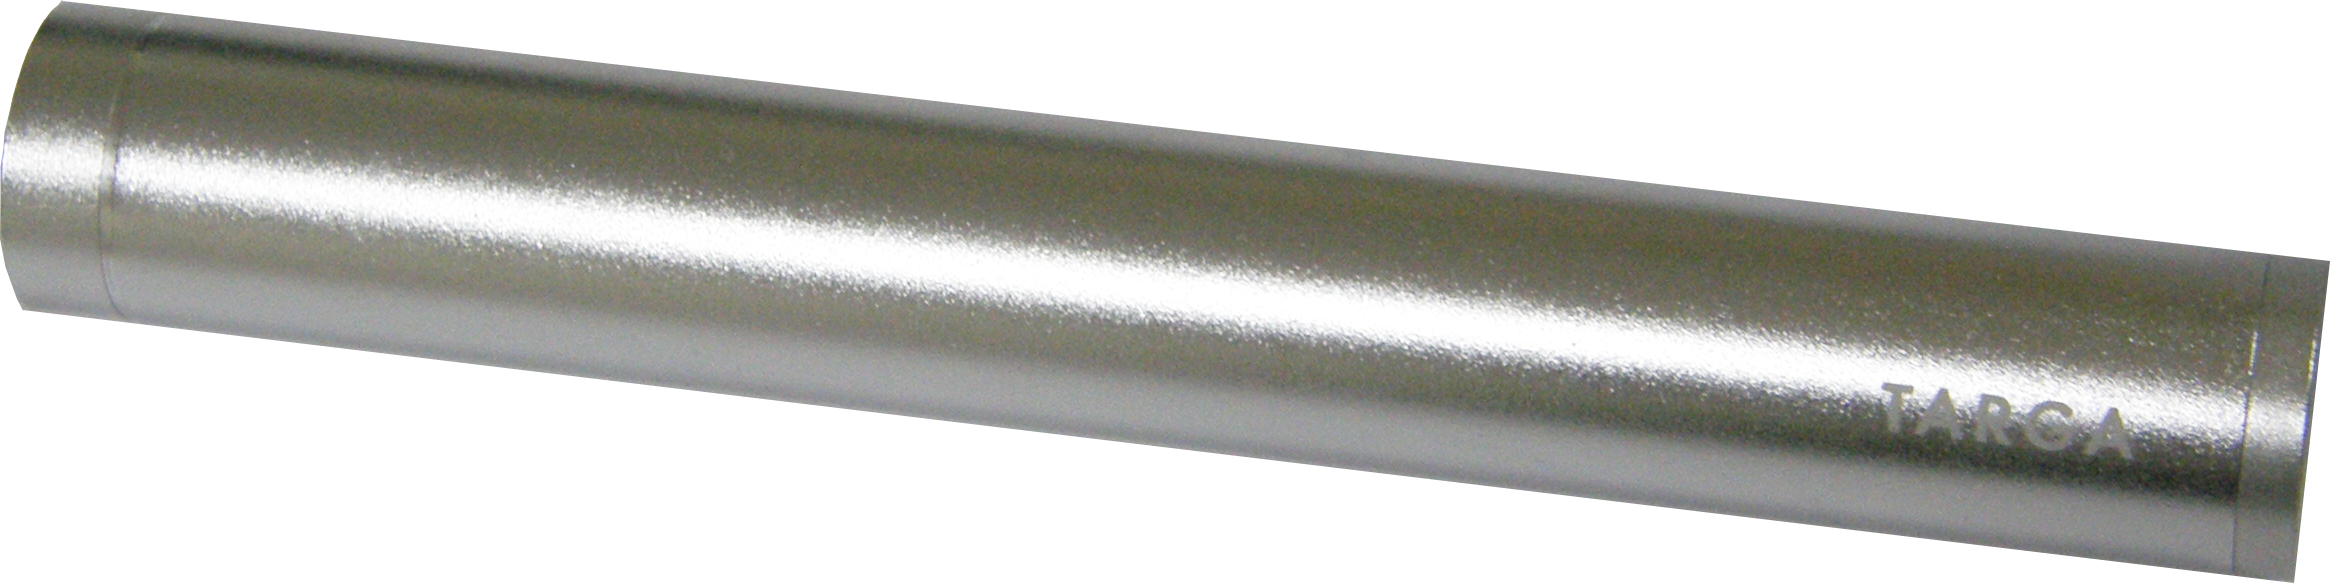 upower5200